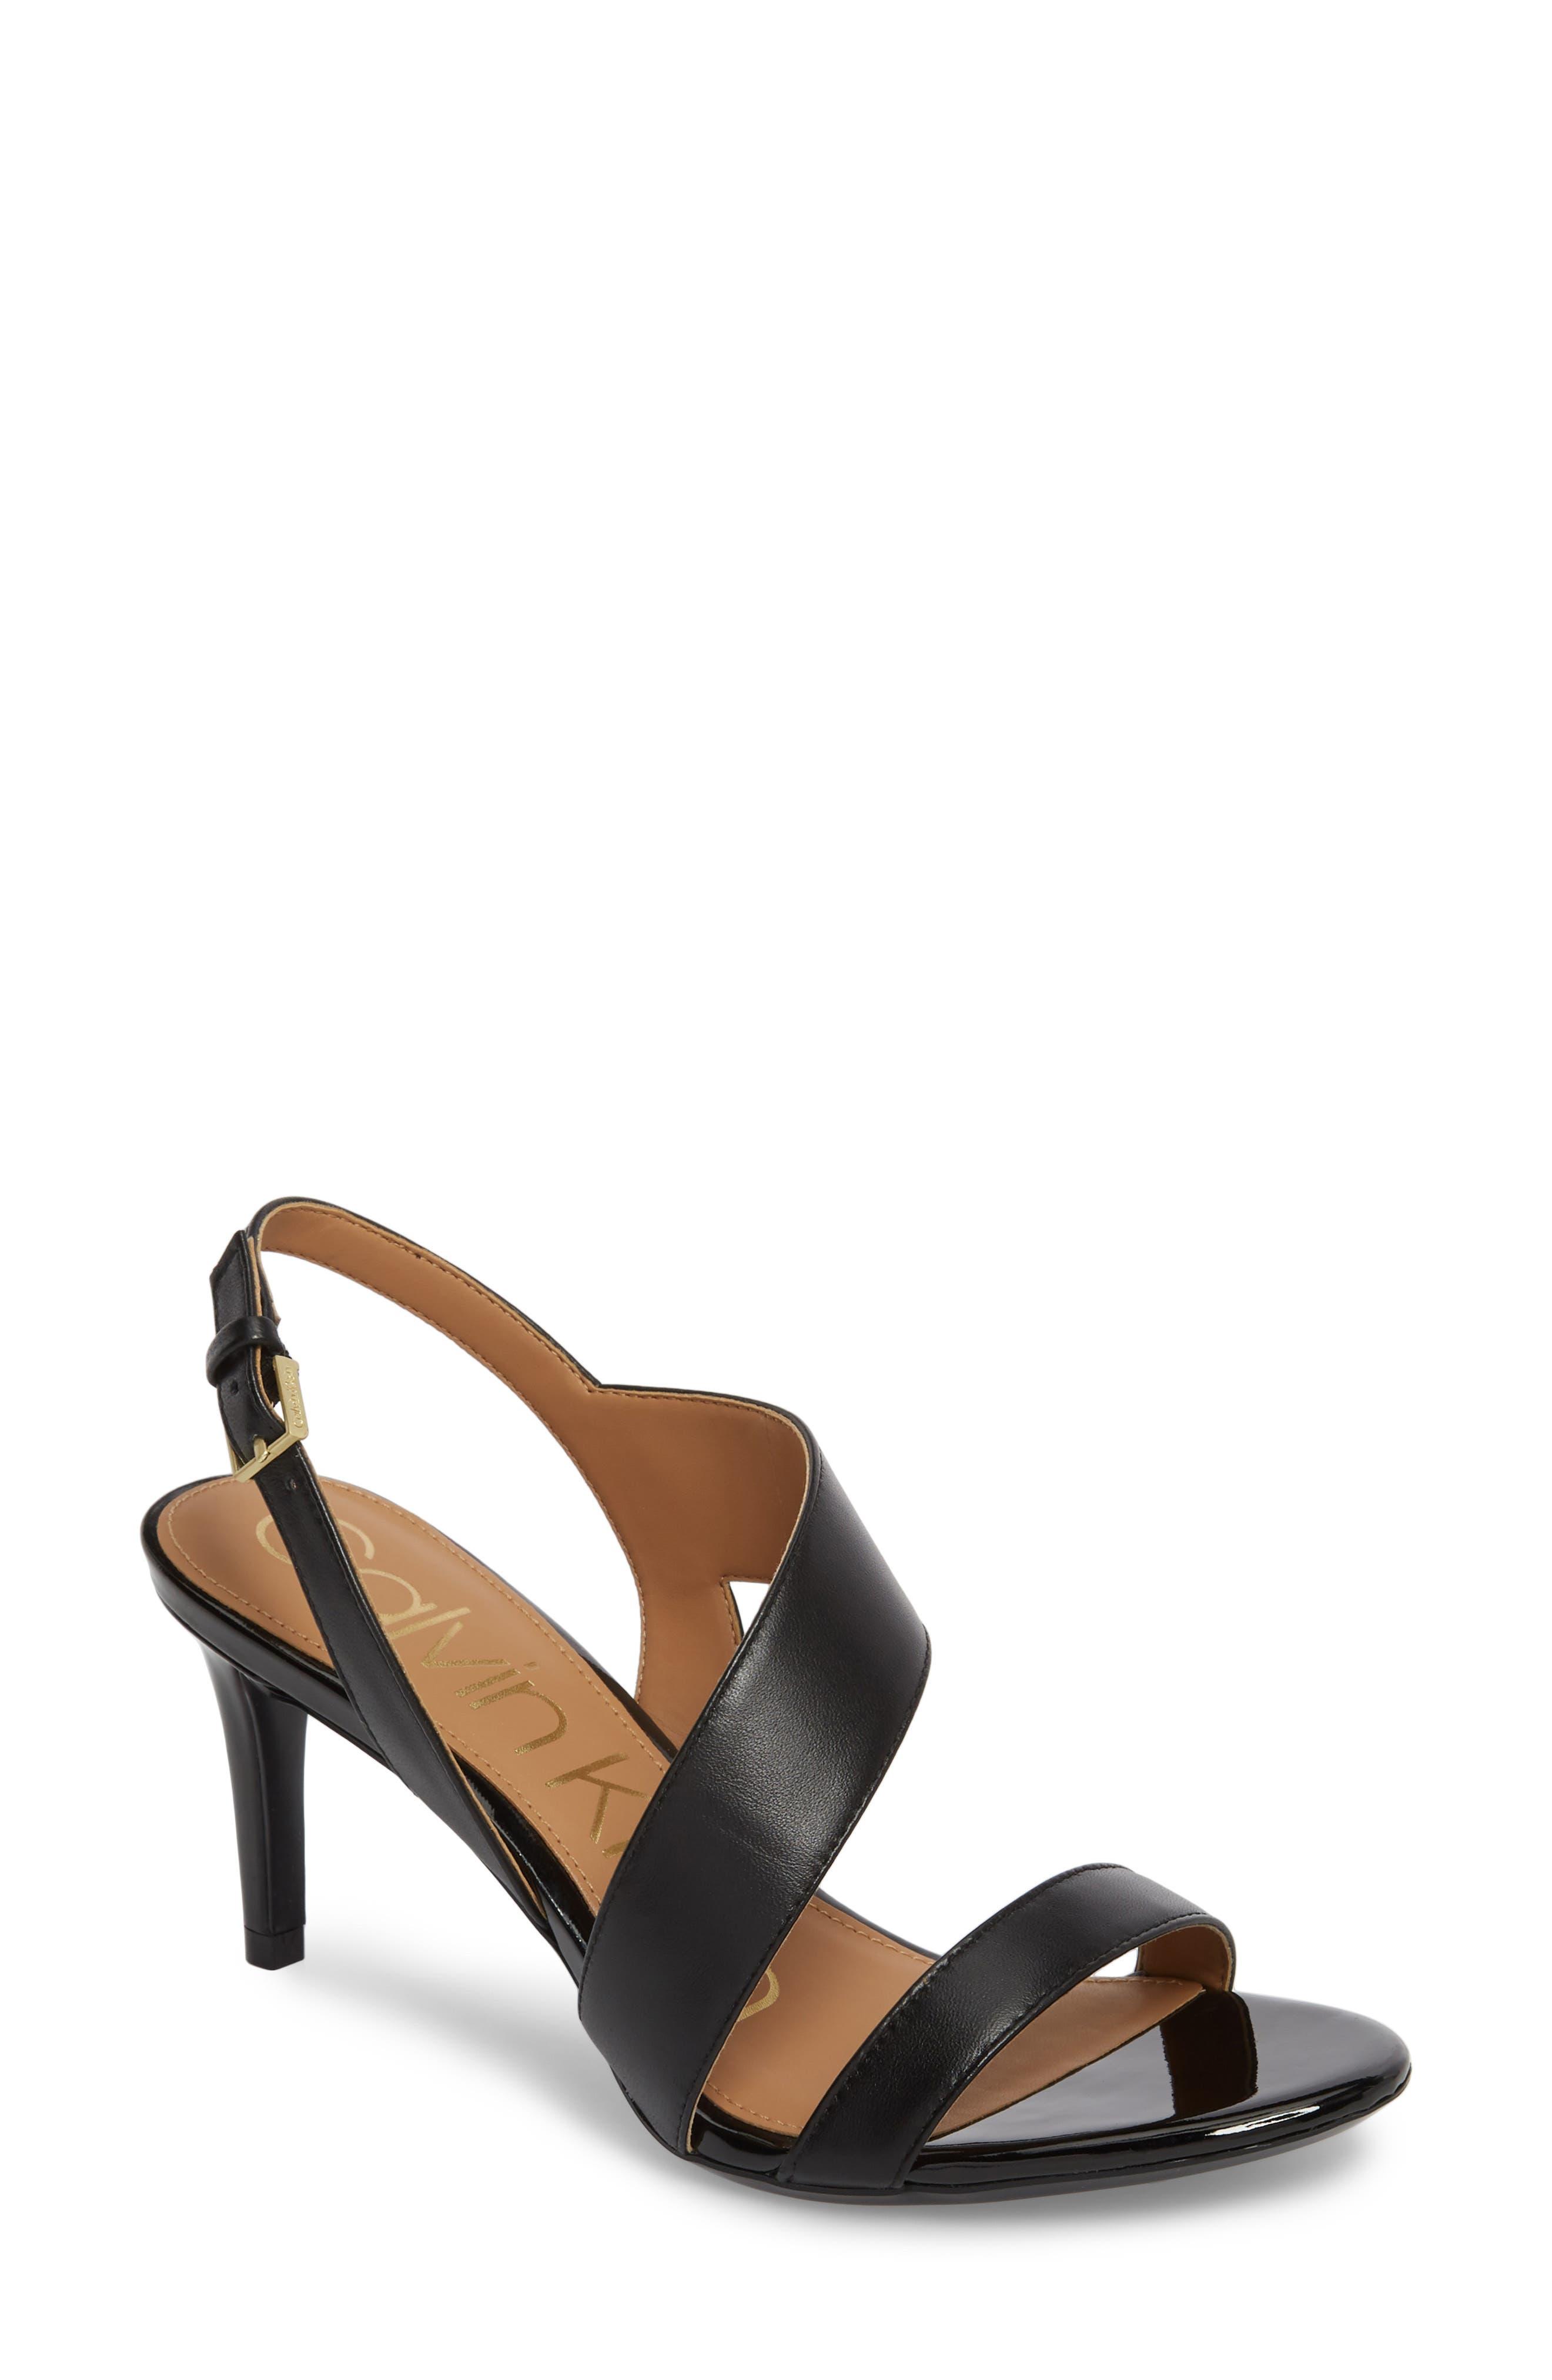 Lancy Sandal,                         Main,                         color, BLACK LEATHER